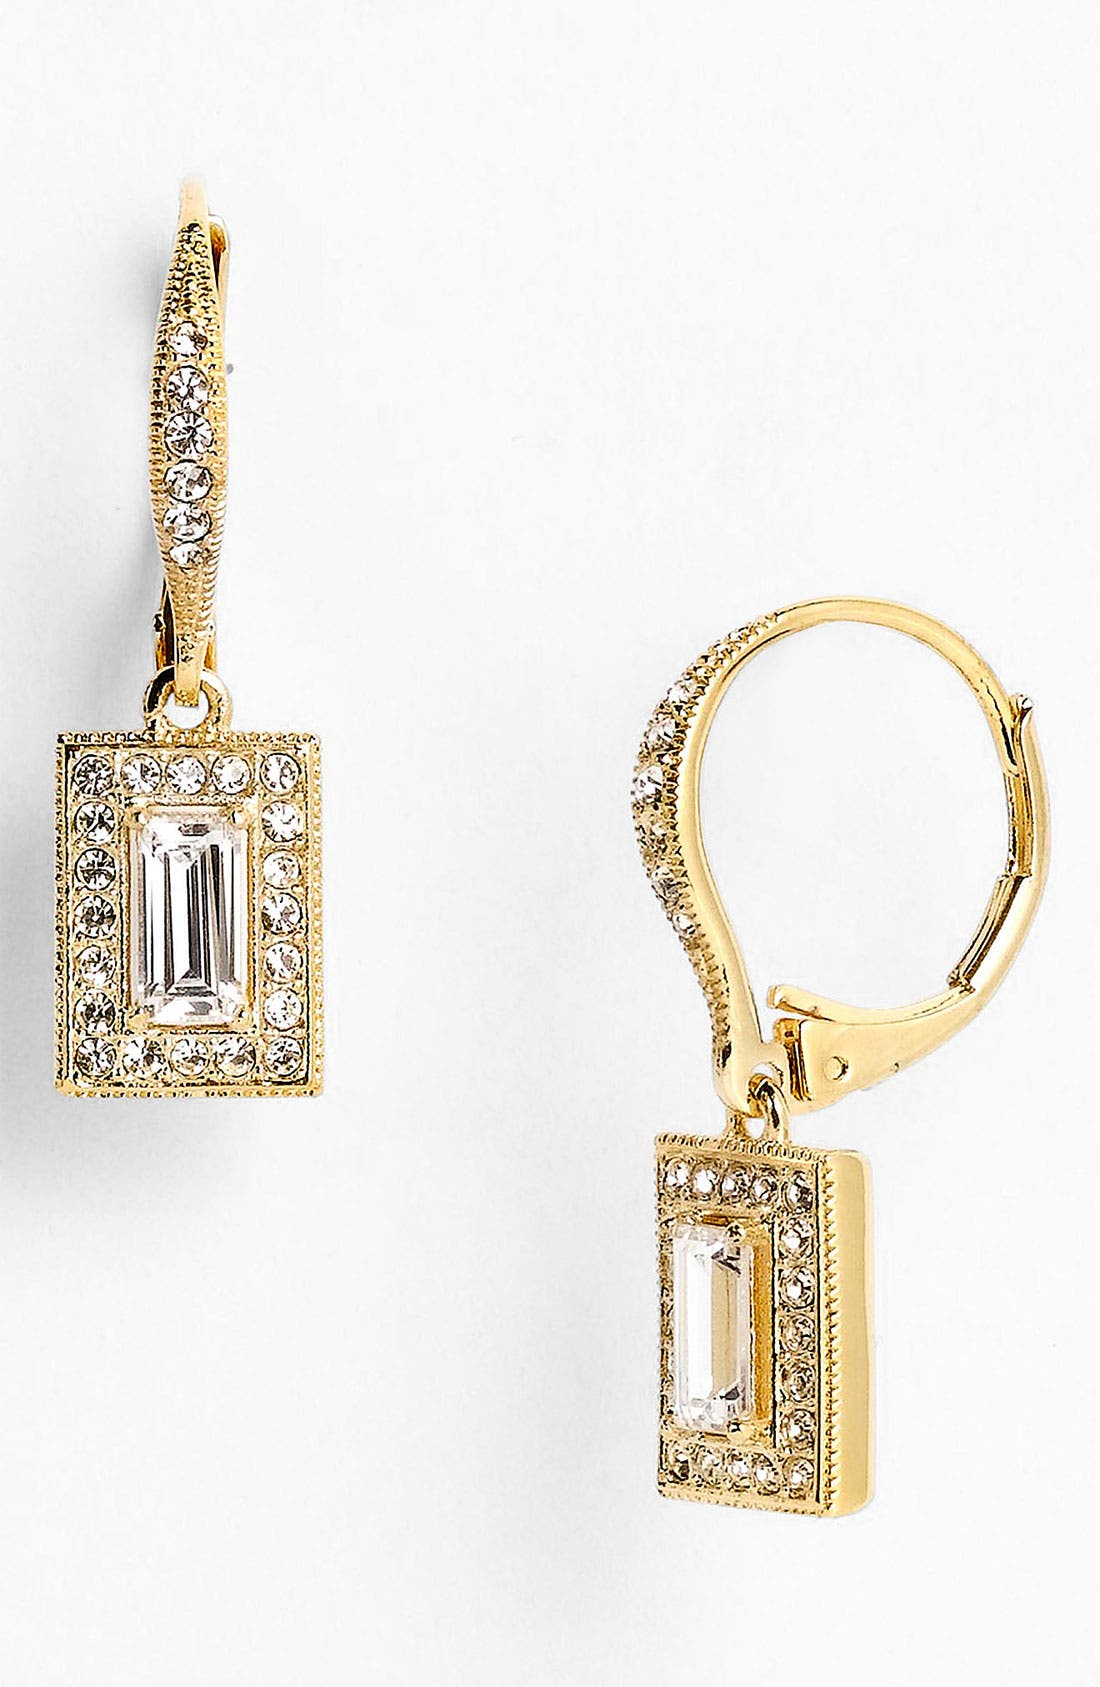 Alternate Image 1 Selected - Nadri 'Art Deco' Drop Earrings (Nordstrom Exclusive)